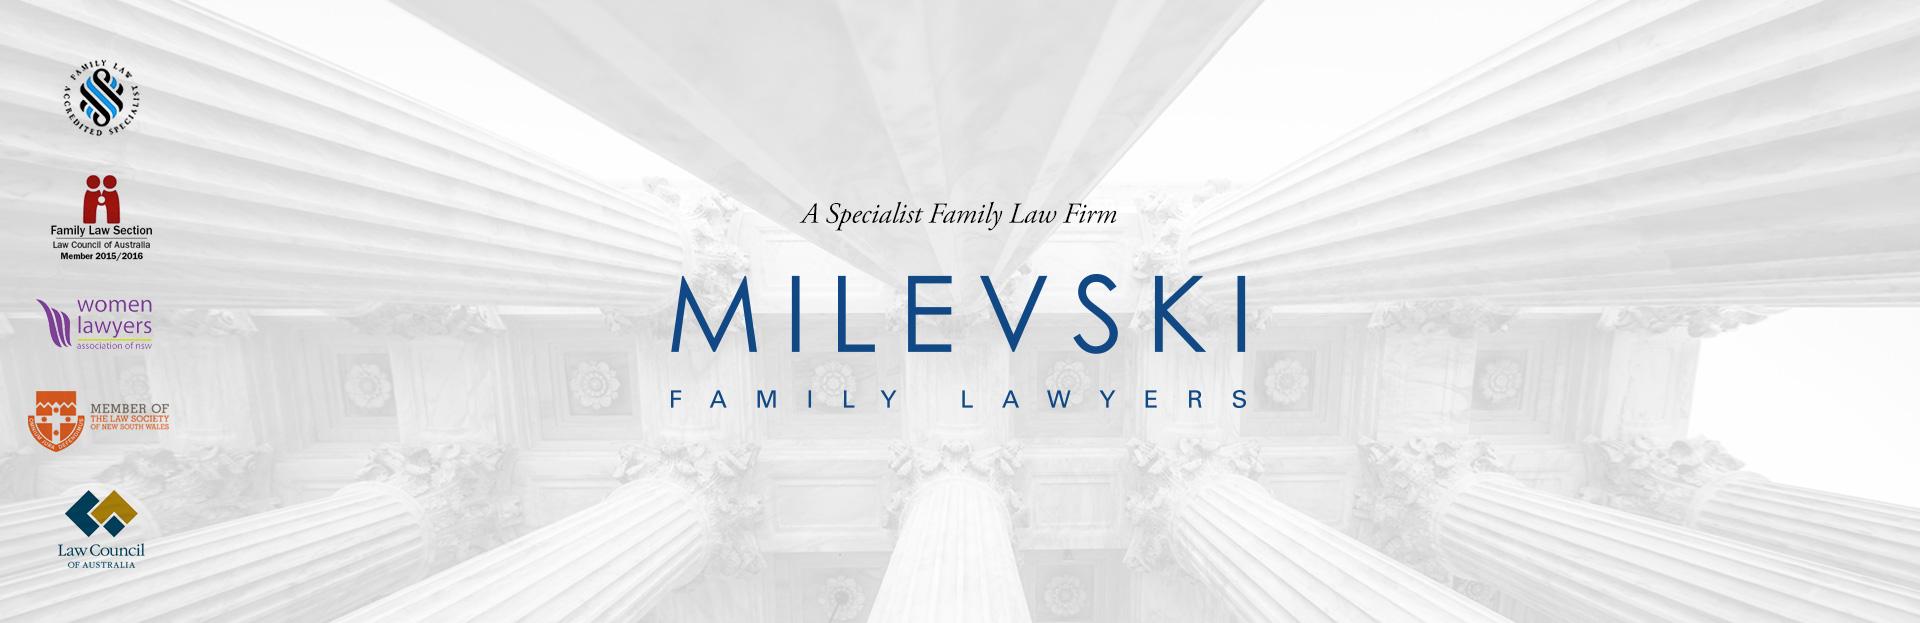 Milevski Family Lawyers